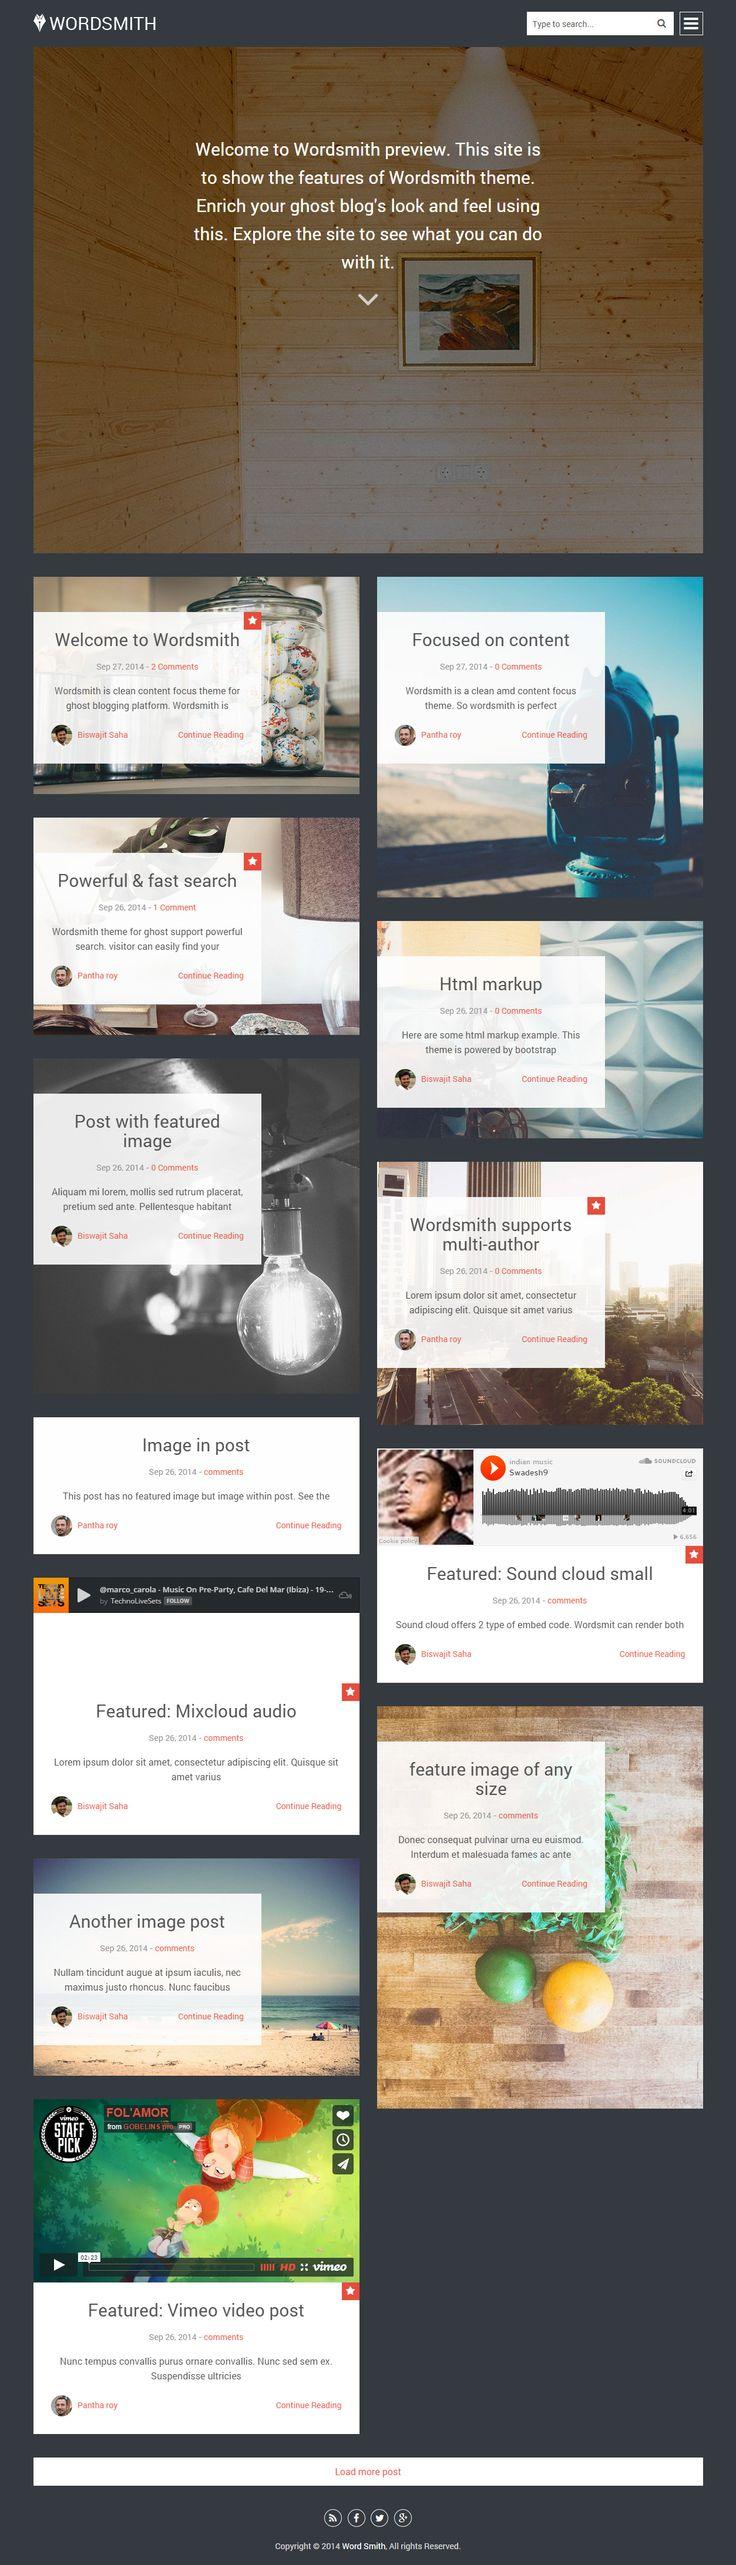 Wordsmith is Premium full Responsive Ghost Blog Theme. Flat Design. Masonry layout. Retina Ready. Bootstrap Framework. http://www.responsivemiracle.com/cms/wordsmith-premium-responsive-masonry-style-ghost-theme/